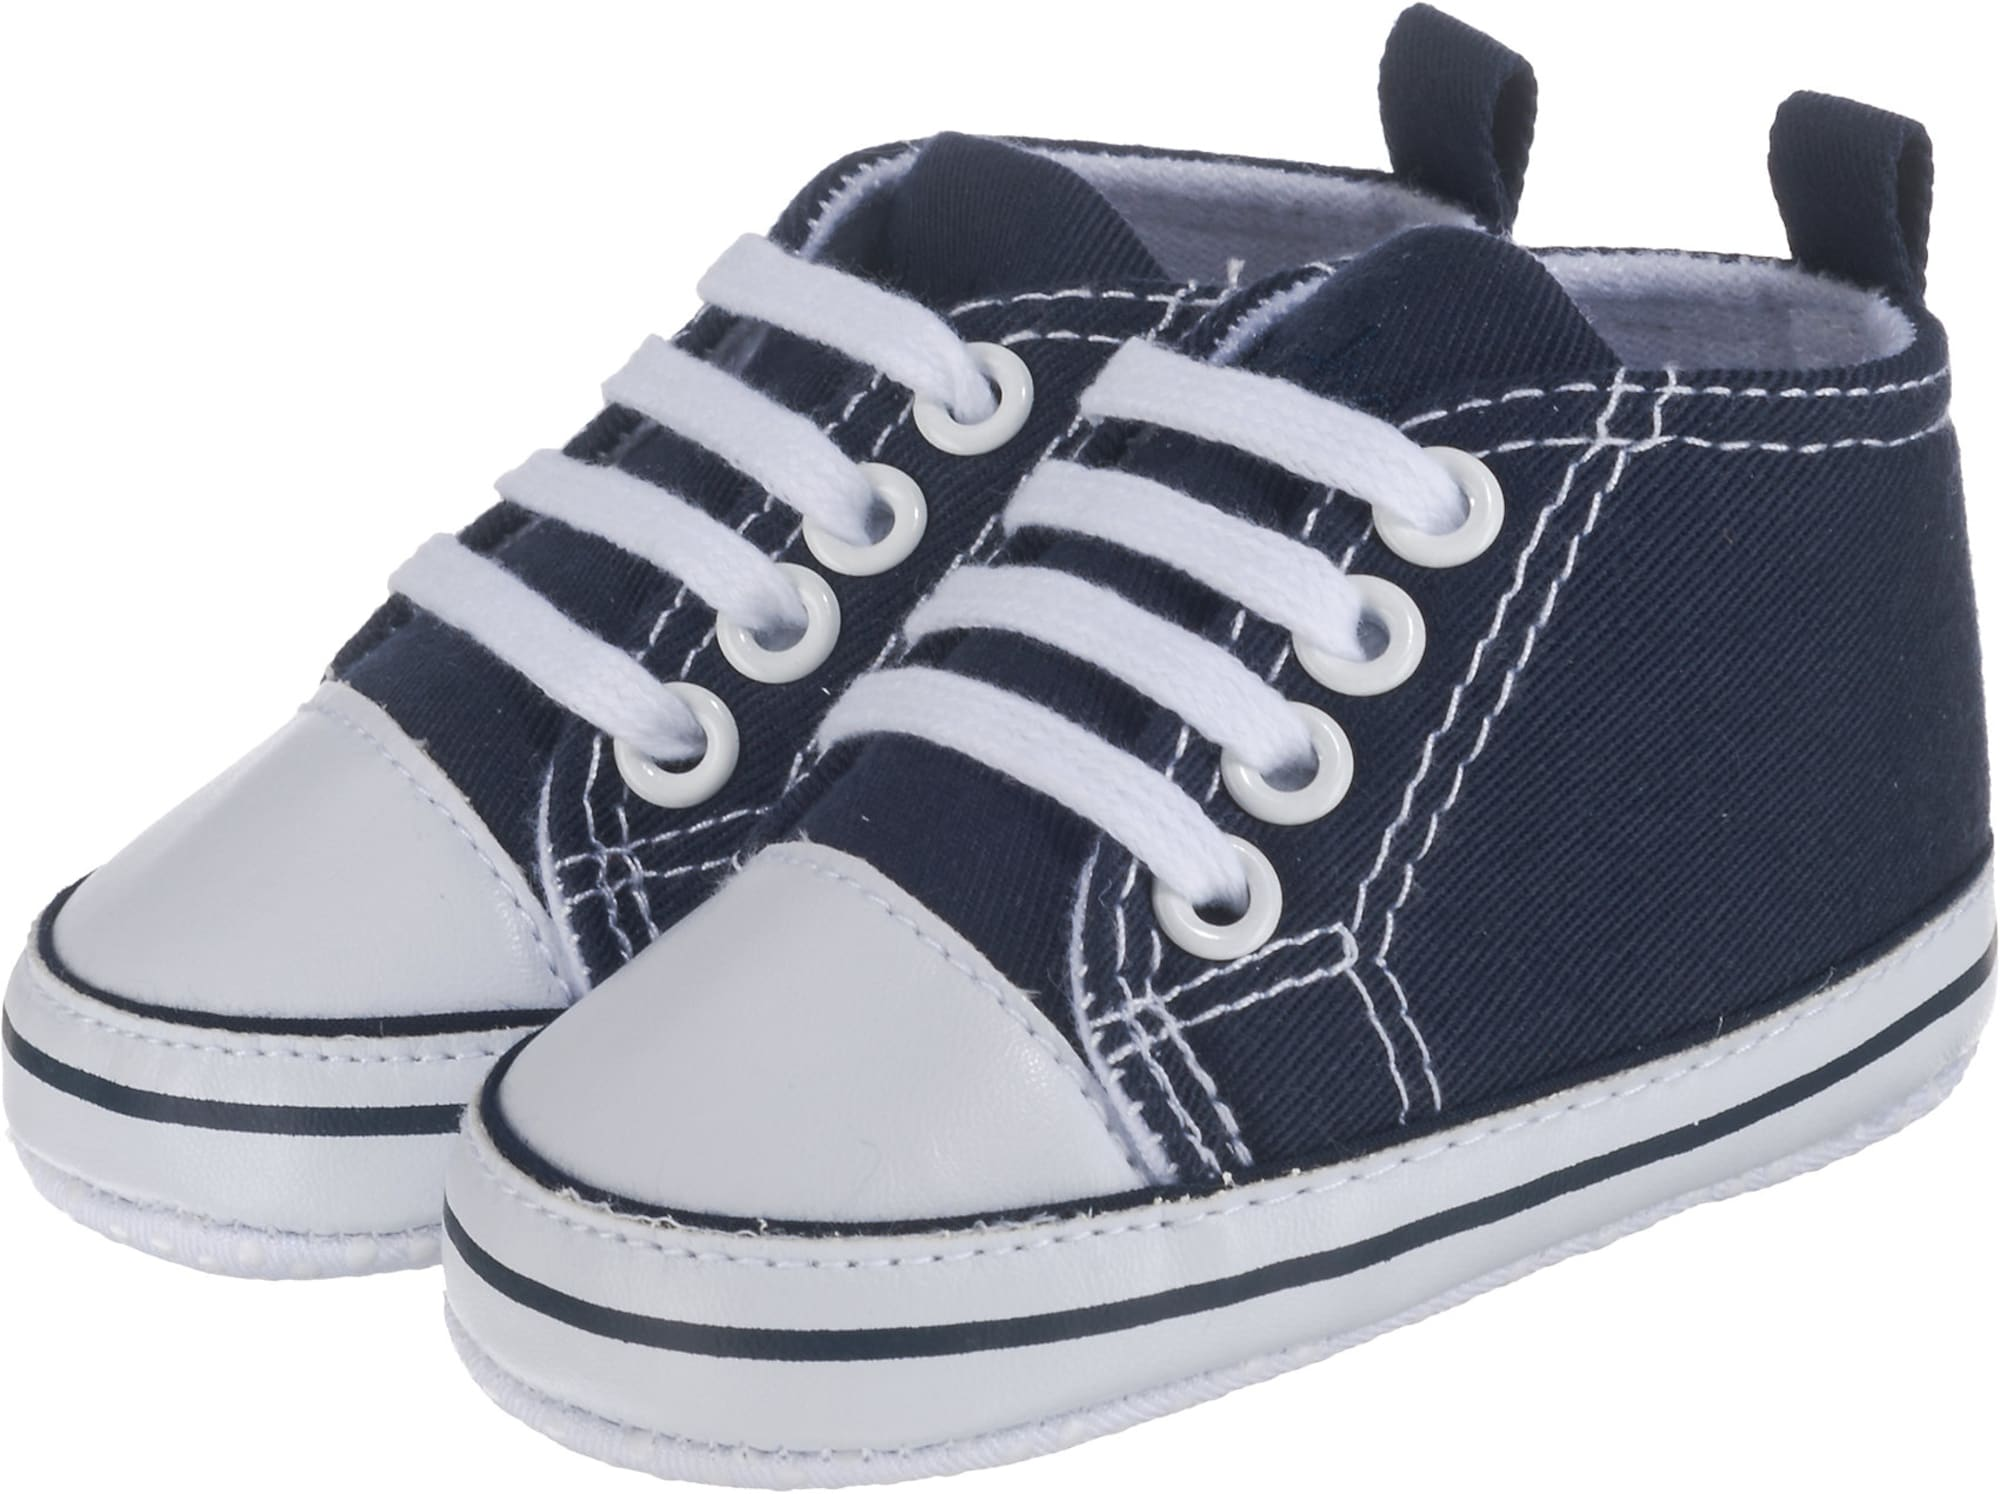 Babyschuhe - Schuhe - Onlineshop ABOUT YOU